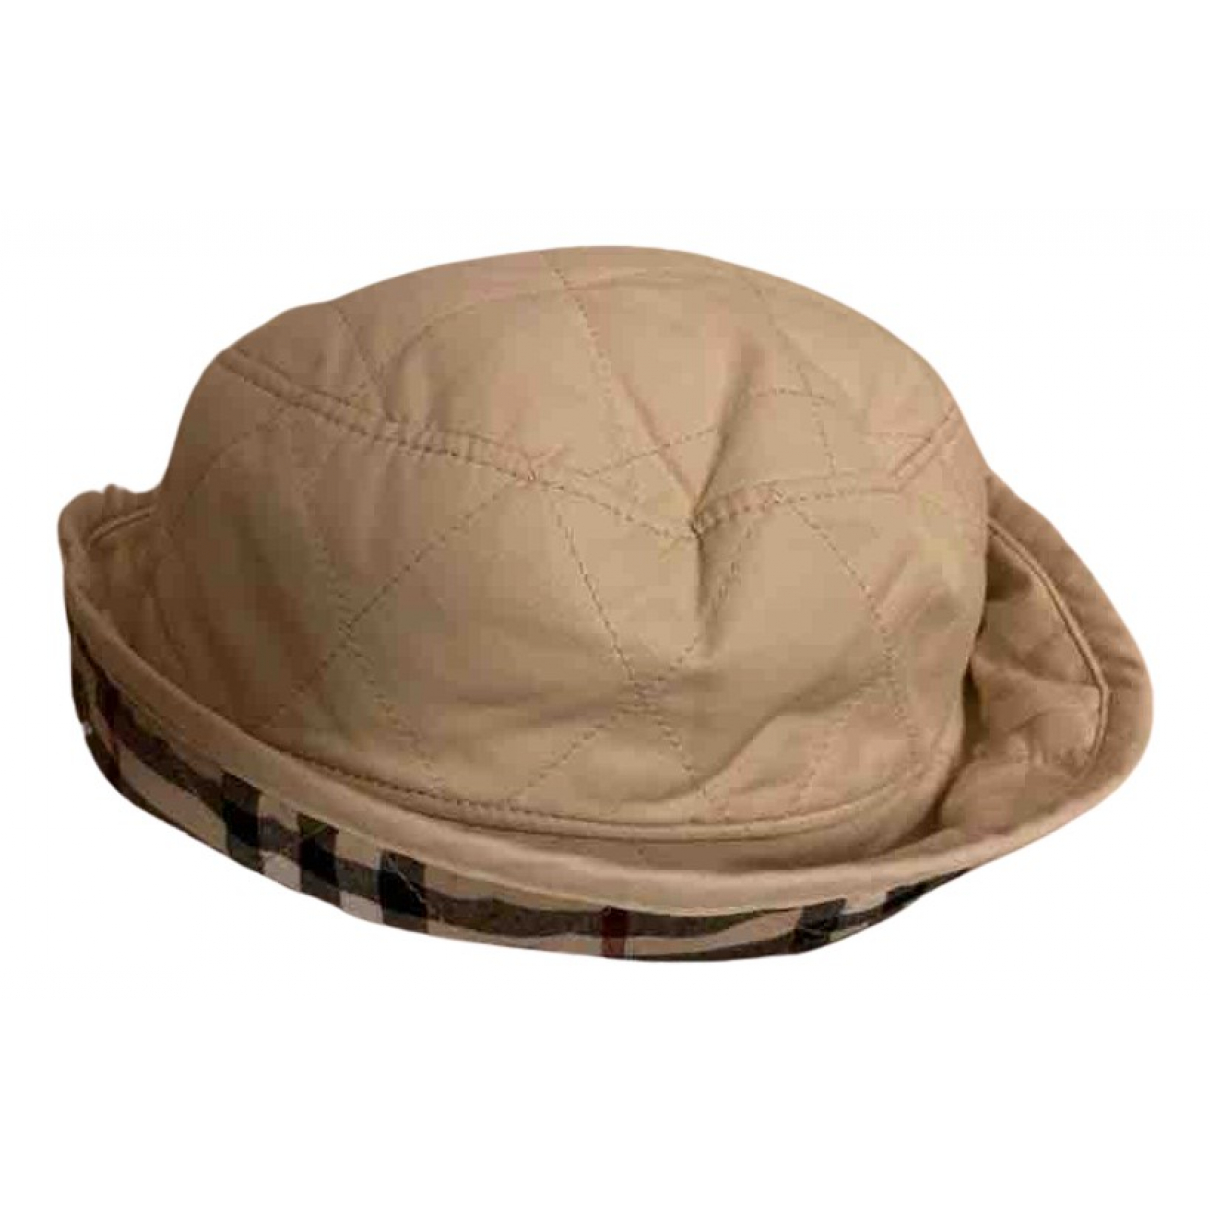 Burberry \N Hut, Muetzen, Handschuhe in  Beige Baumwolle